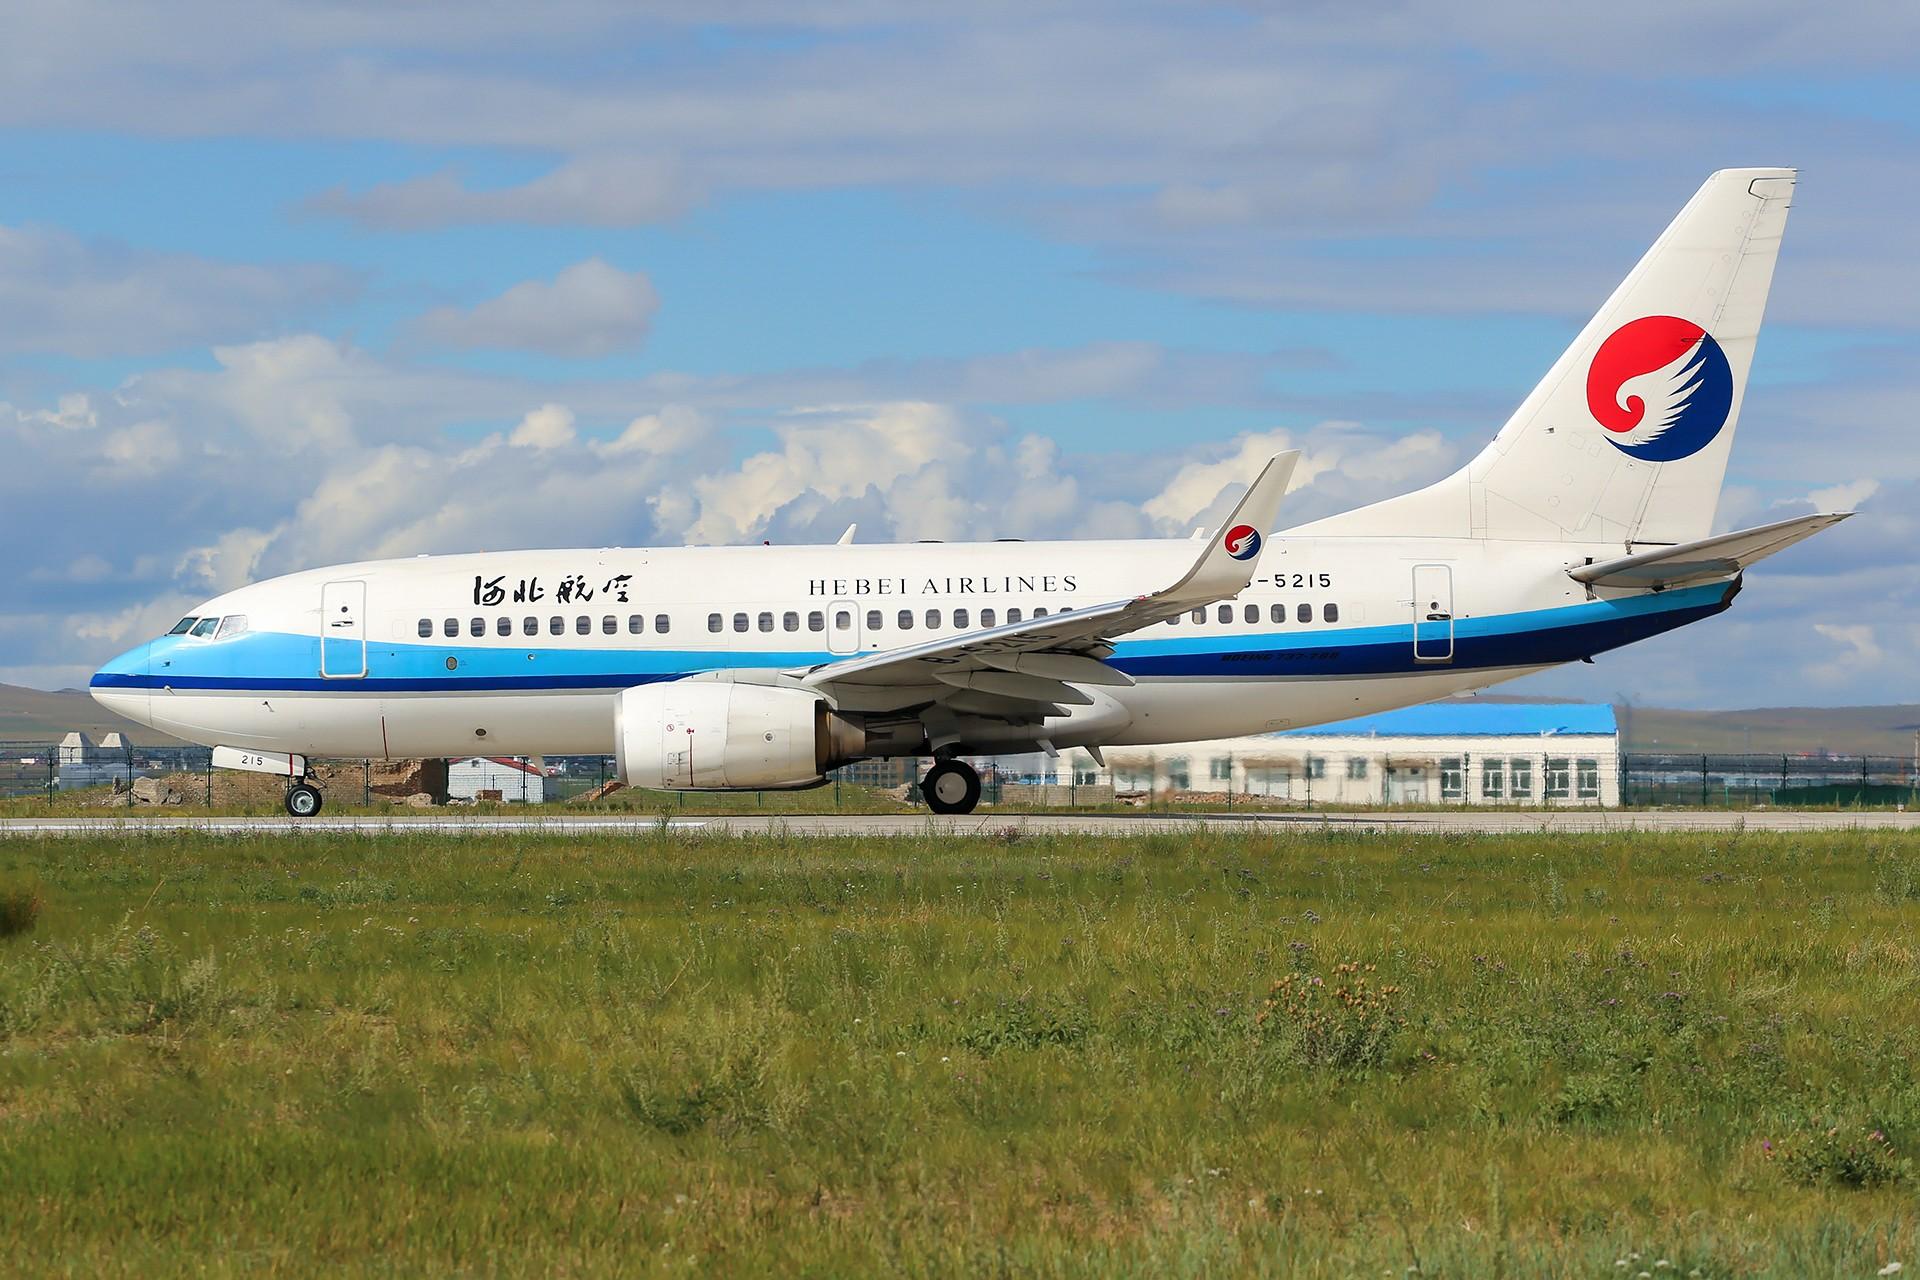 Re:[原创][NZH]。。。满洲里。。。 BOEING 737-700 B-5215 中国满洲里西郊机场